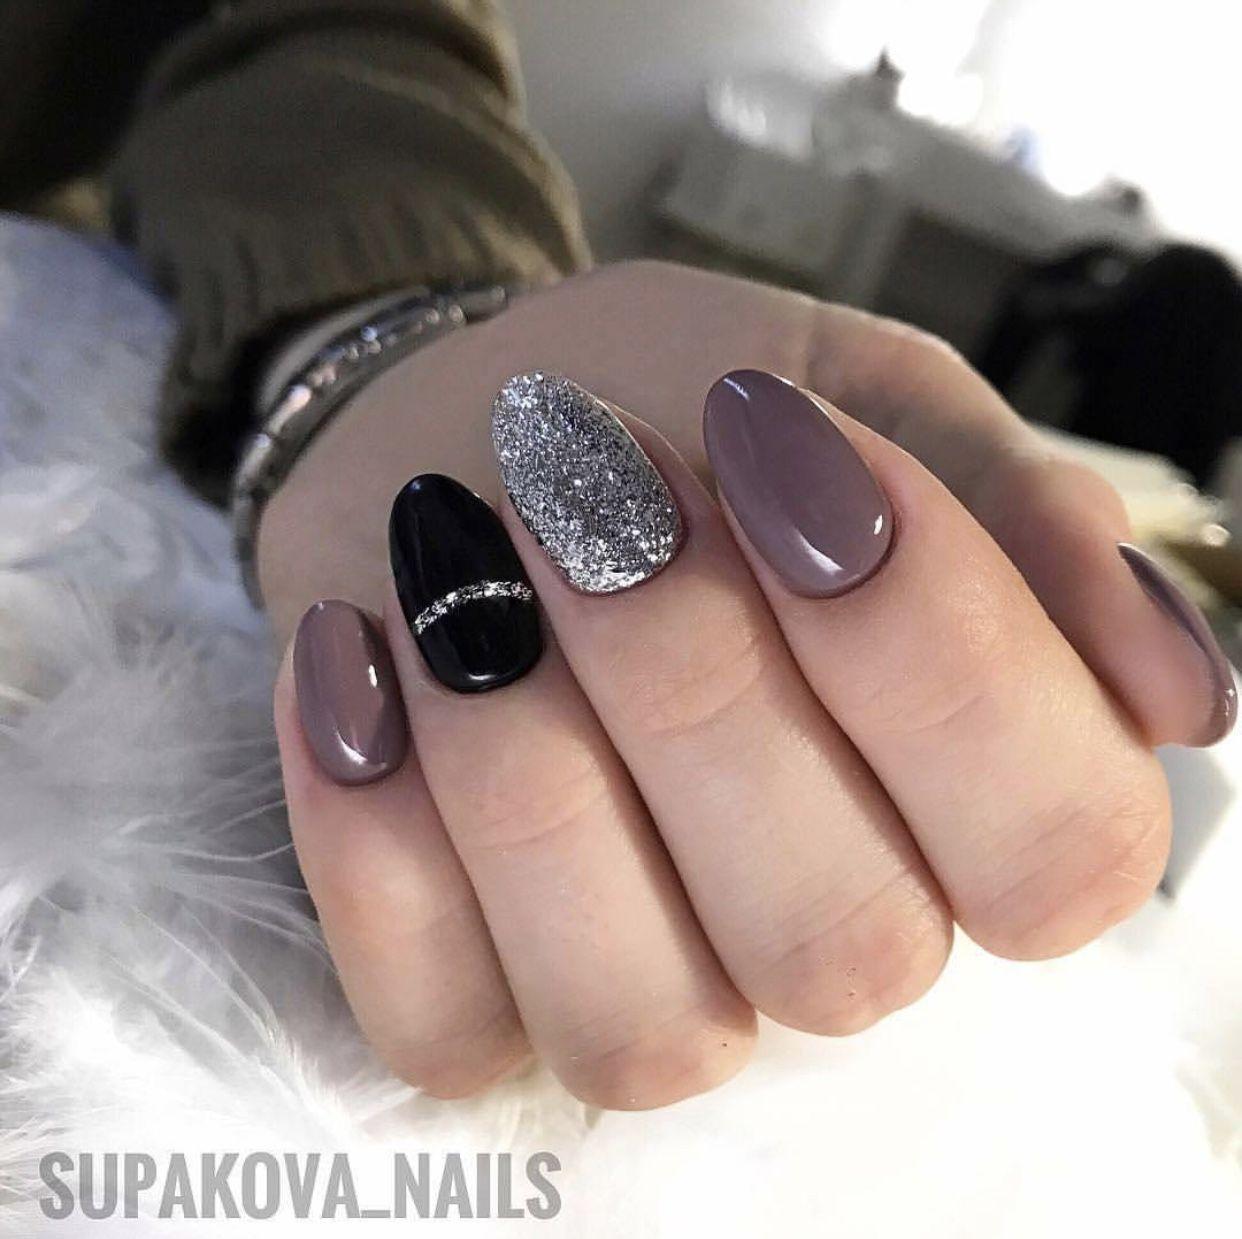 Pin de Bruna Filipa en unhas | Pinterest | Diseños de uñas ...